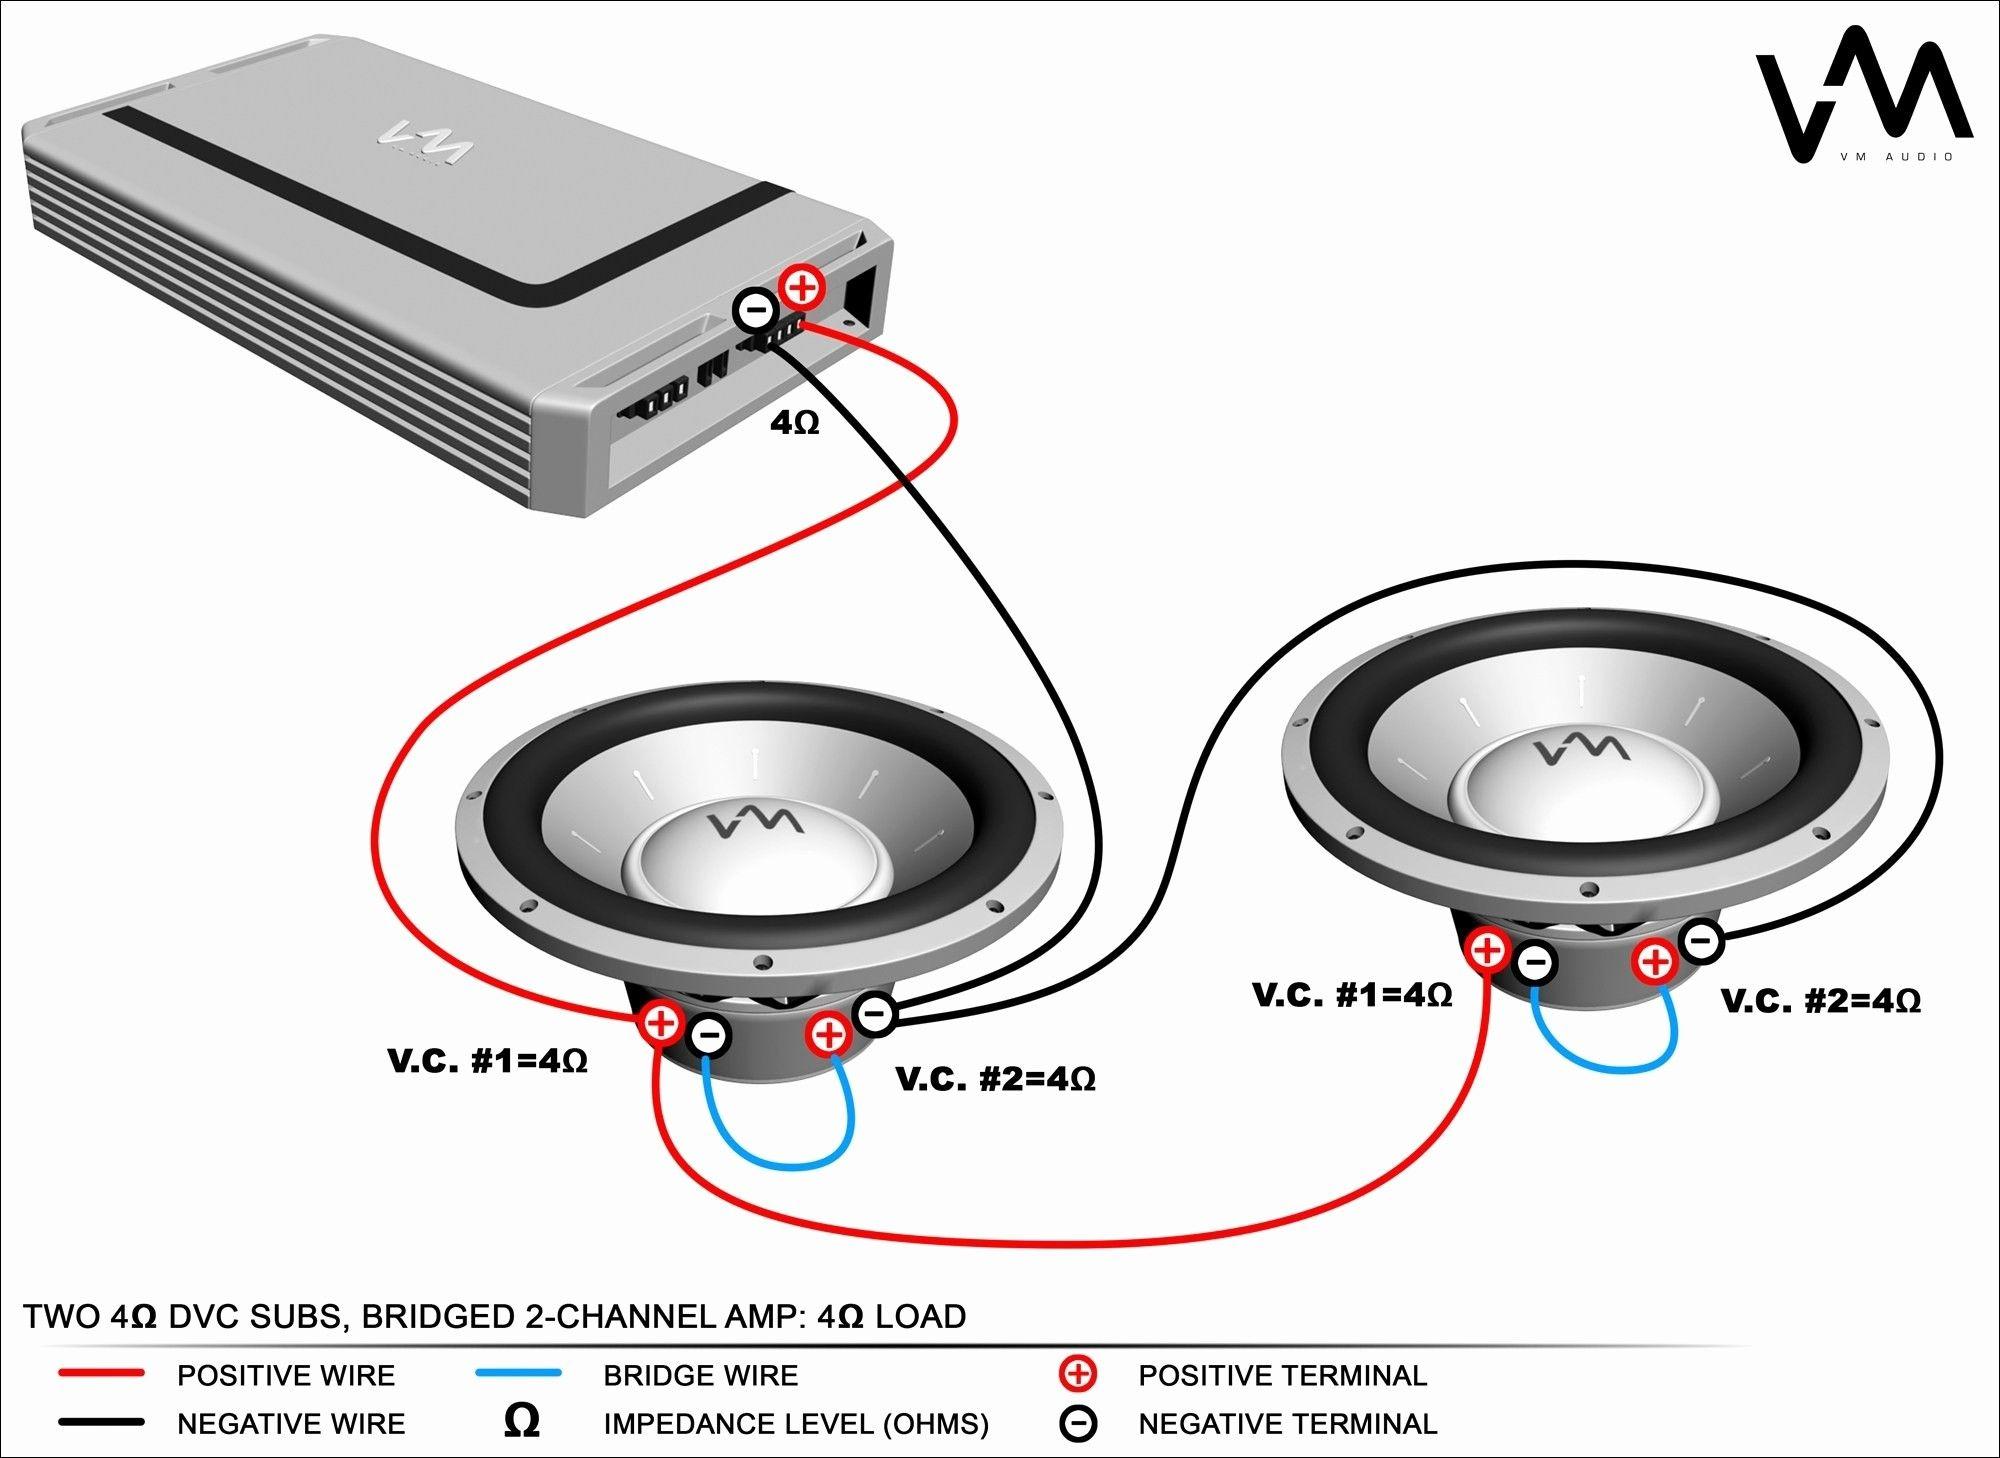 Kicker Cvr 12 2 Ohm Wiring Diagram Best Of in 2020 | Subwoofer wiring, Car  audio, Car audio installation | Punch Dual Voice Coil Wiring Diagram |  | Pinterest